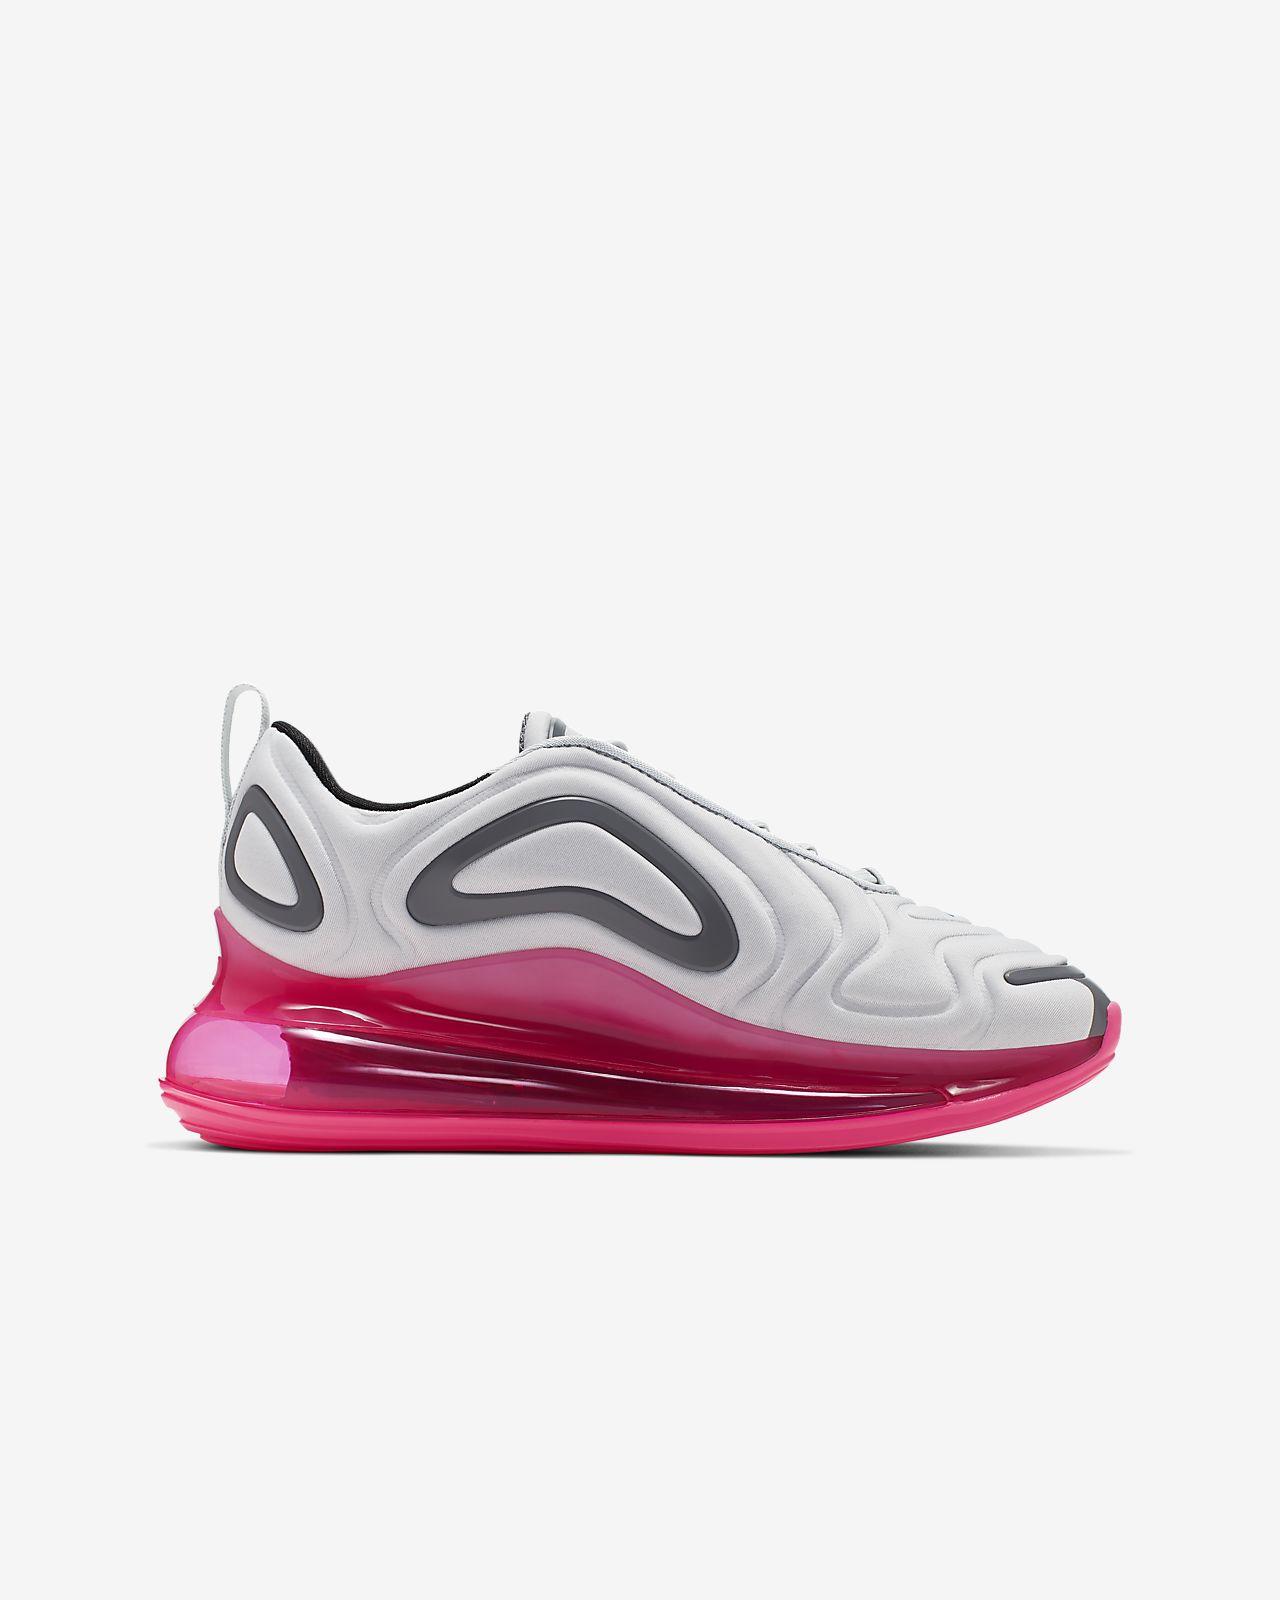 scarpe bambina nike 27